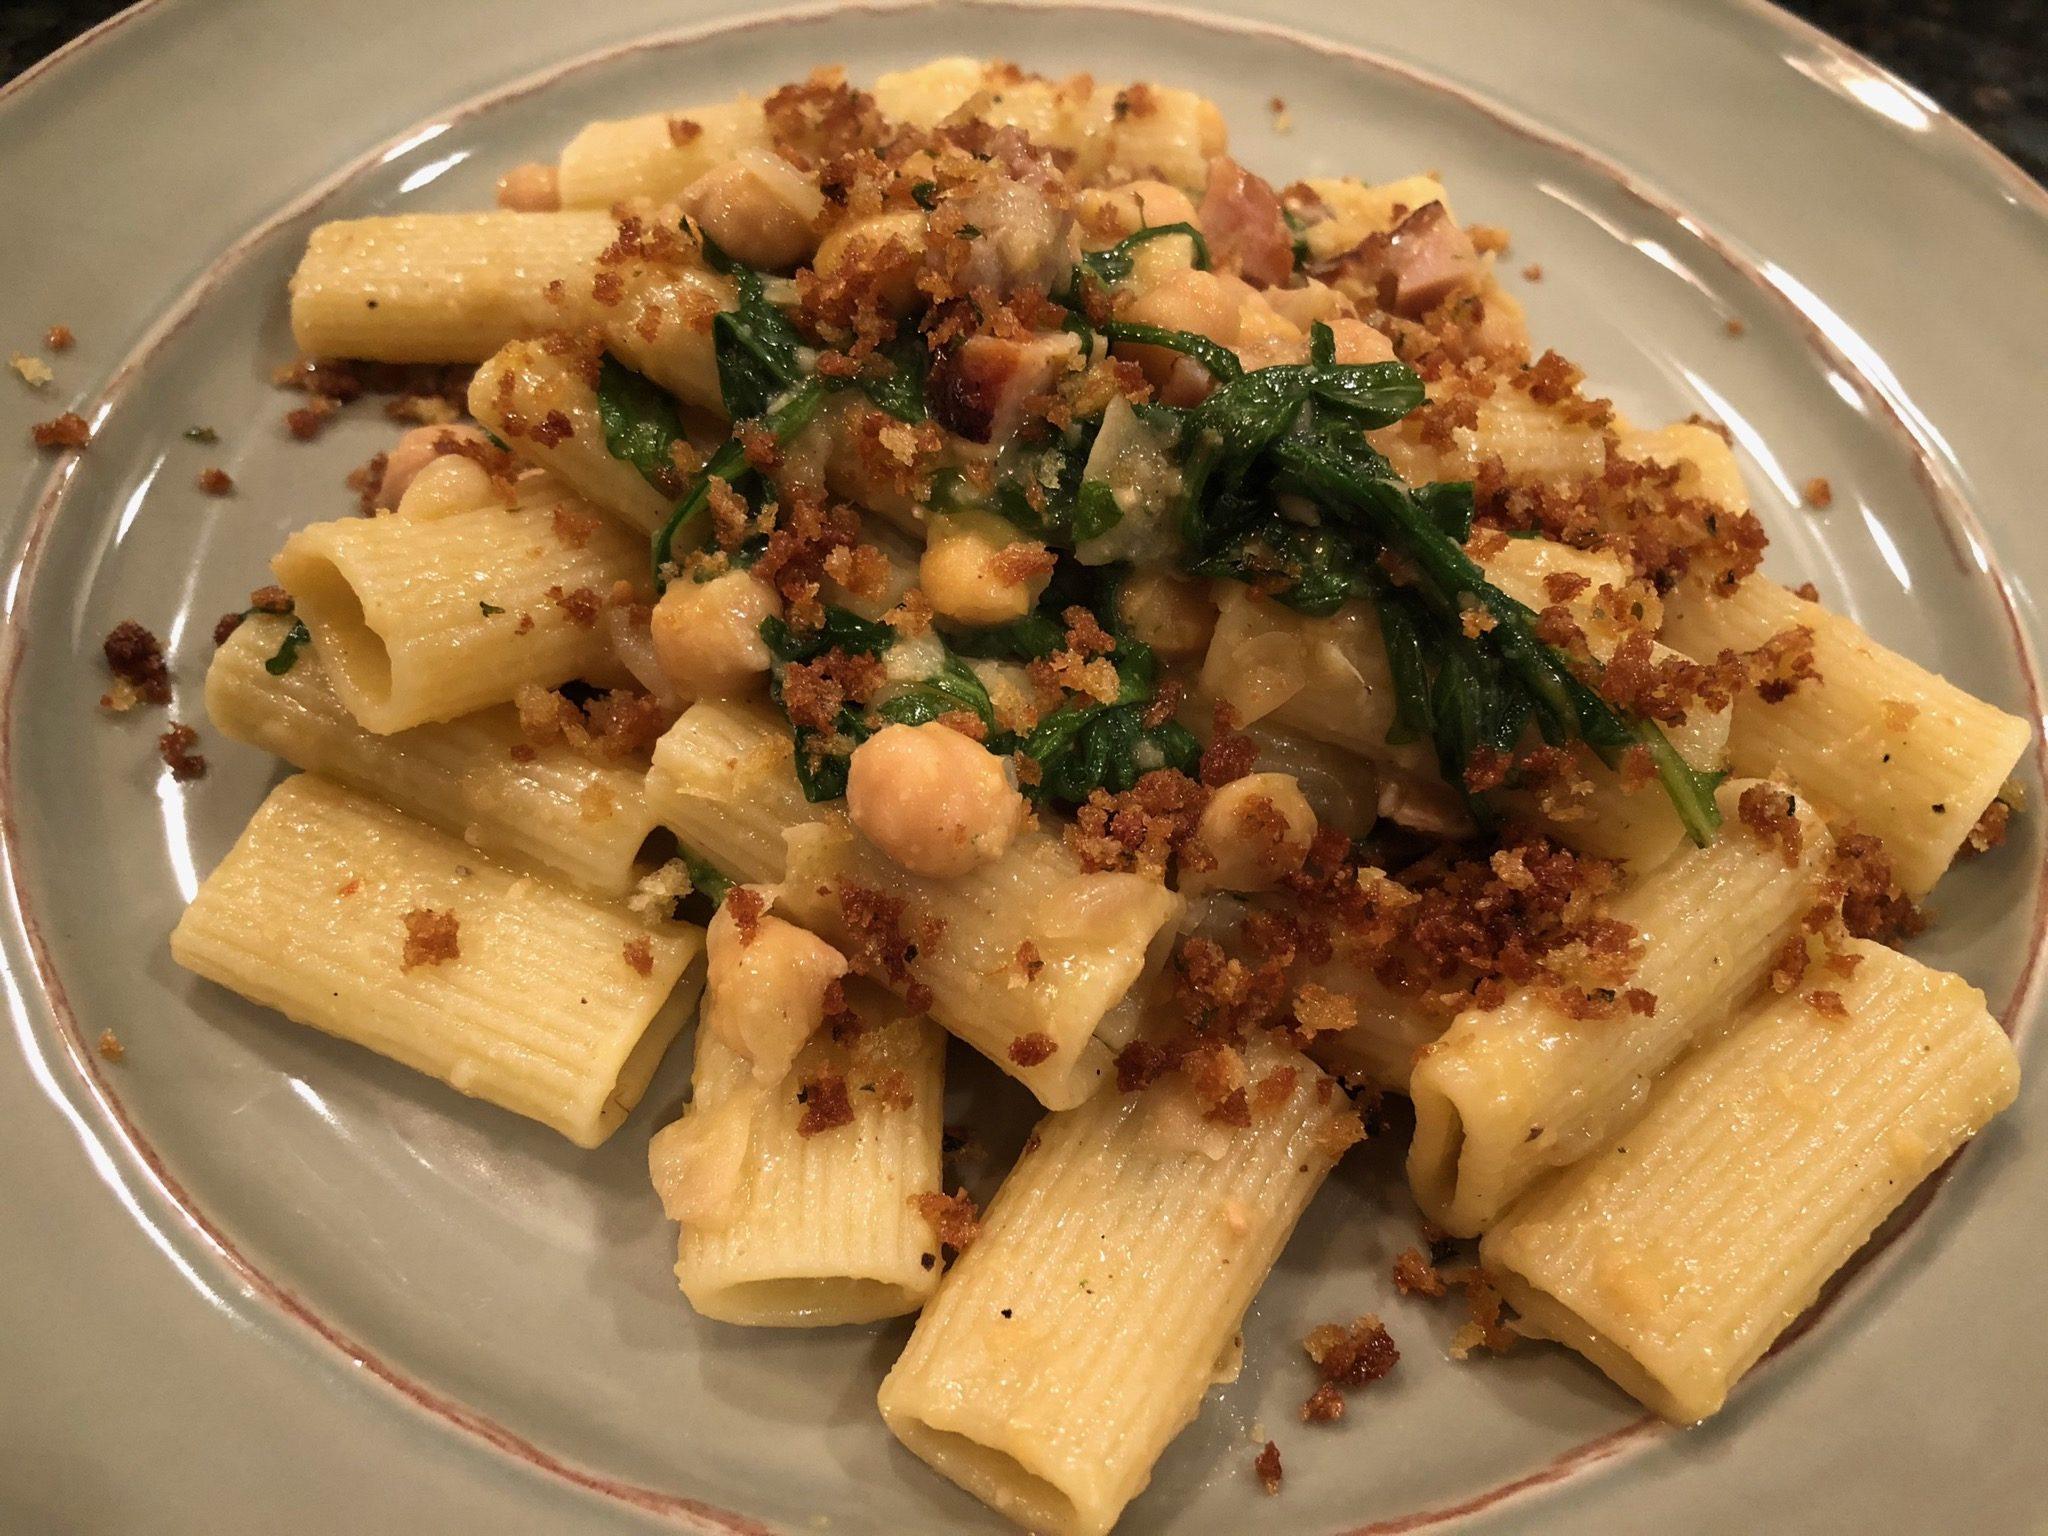 Rigatoni pasta with cece and rucola